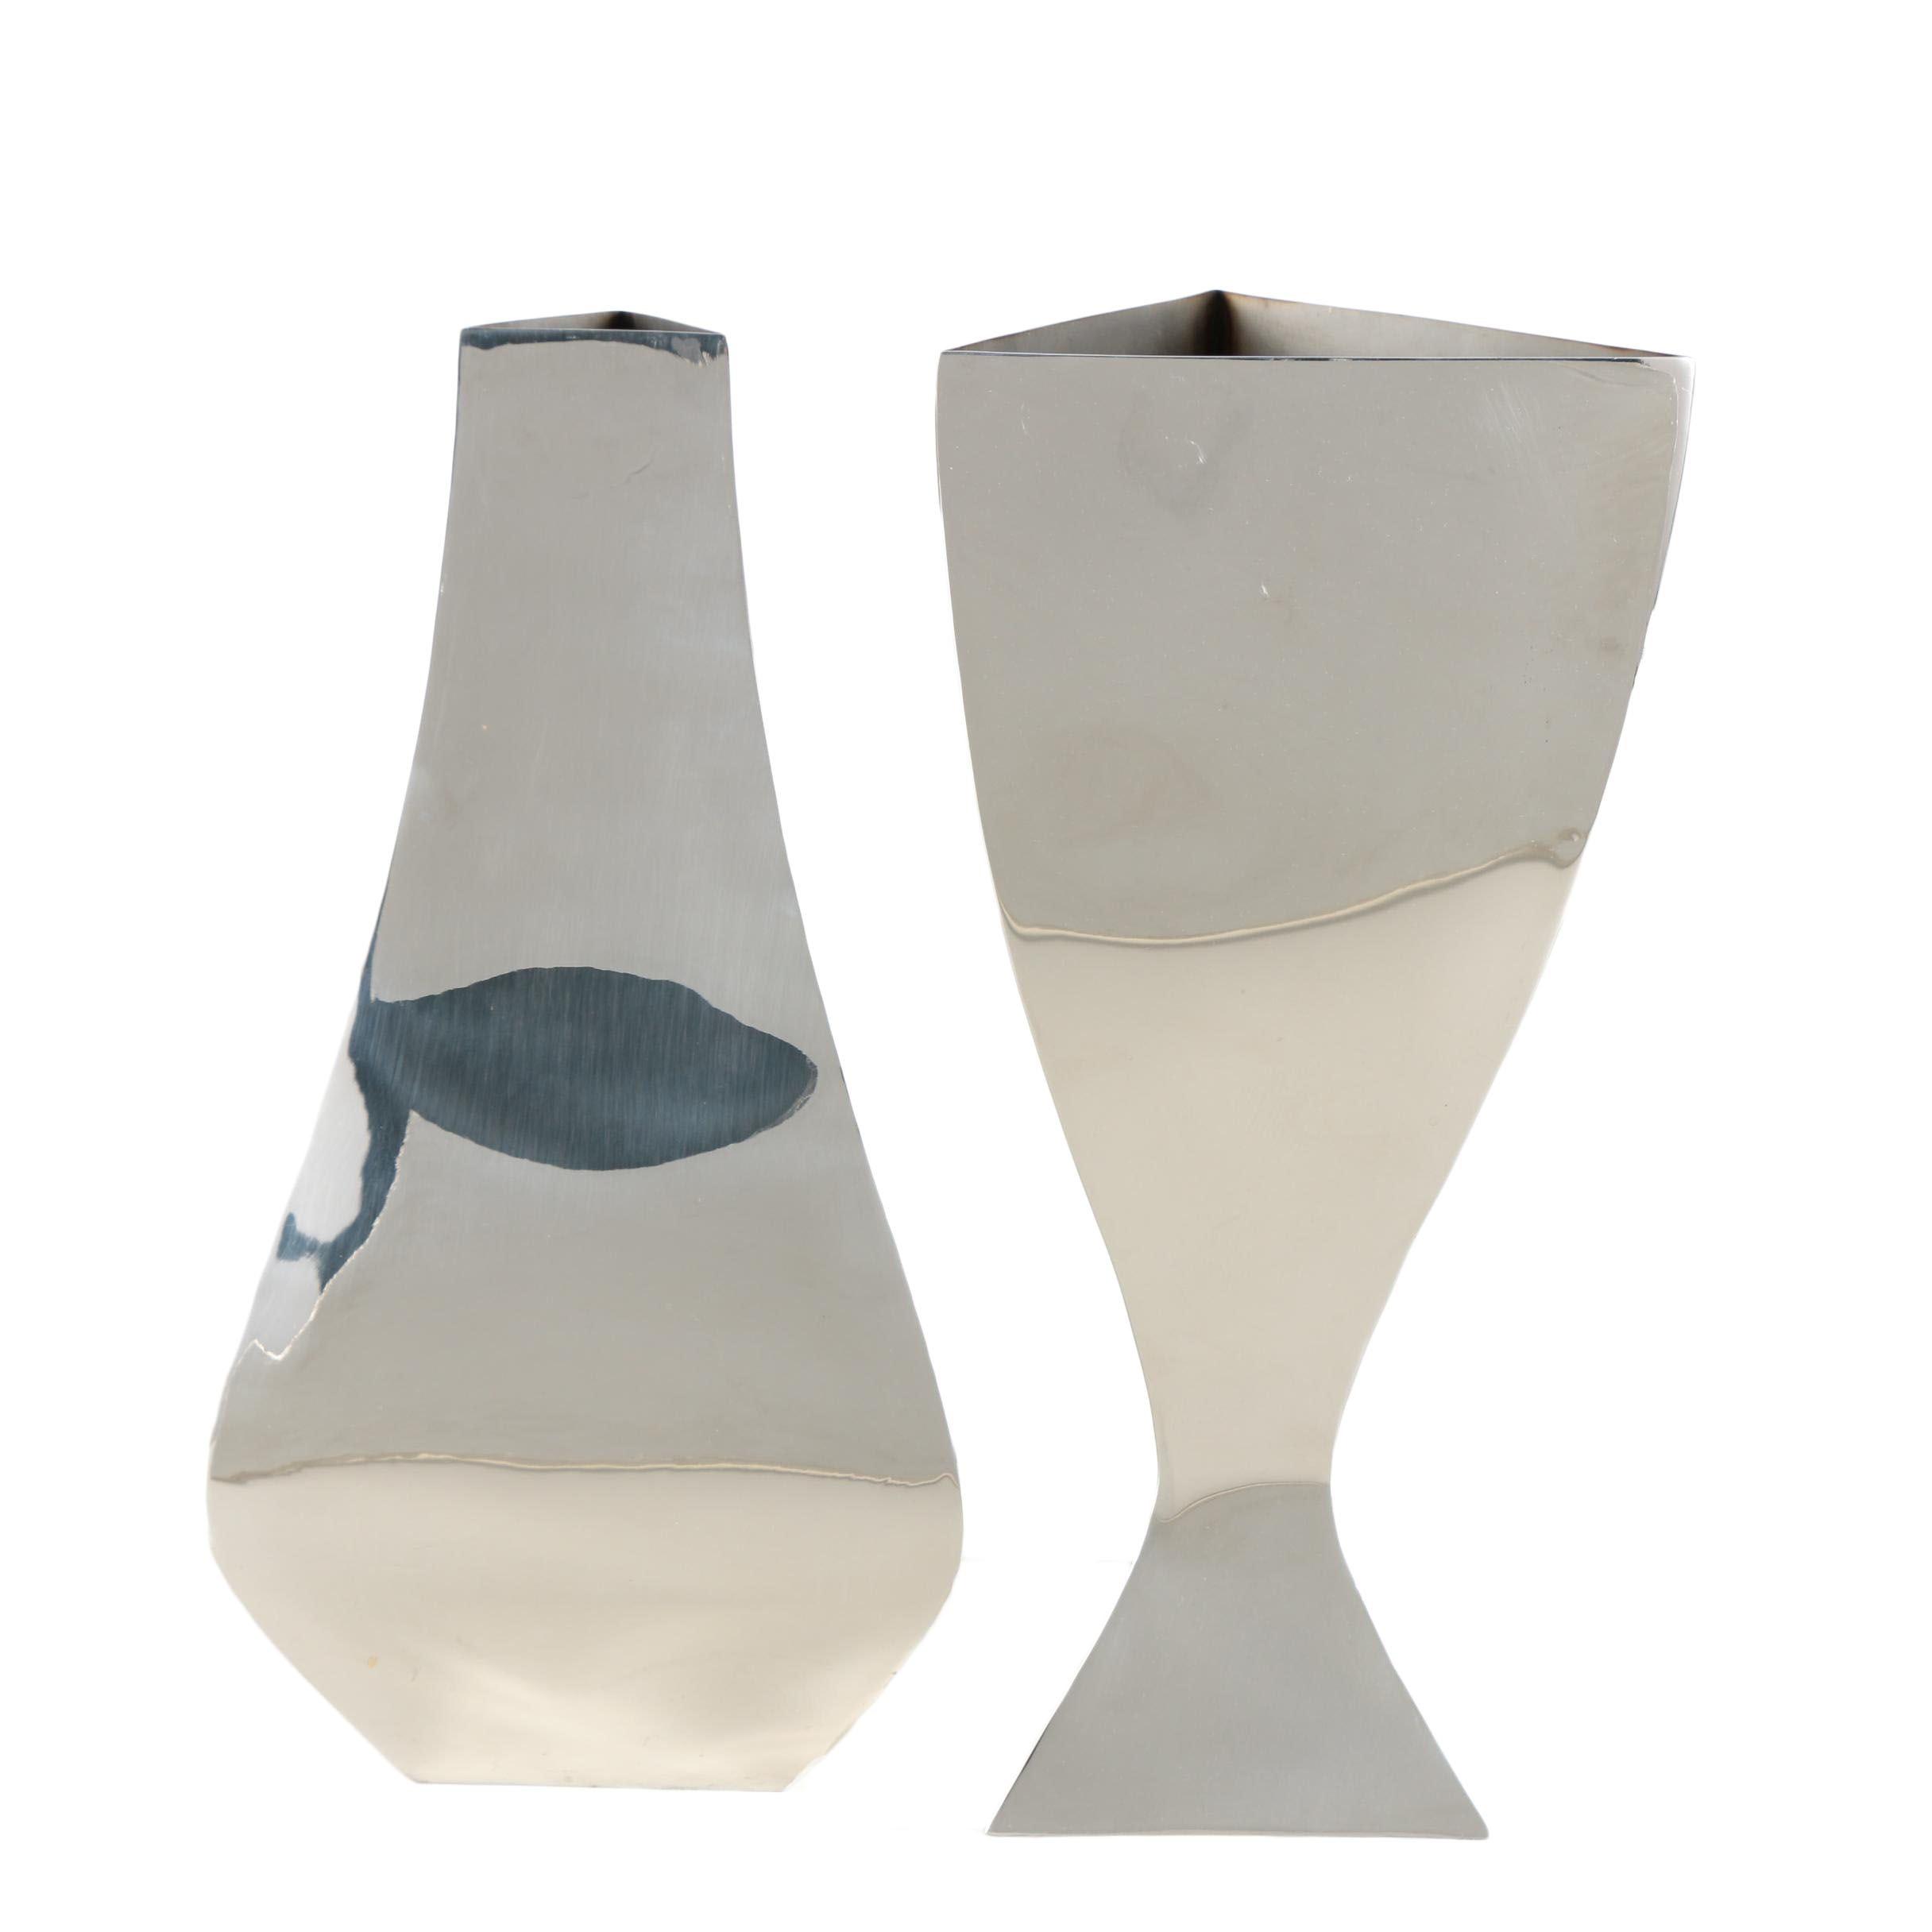 Michael Aram Mirrored Metal Vases